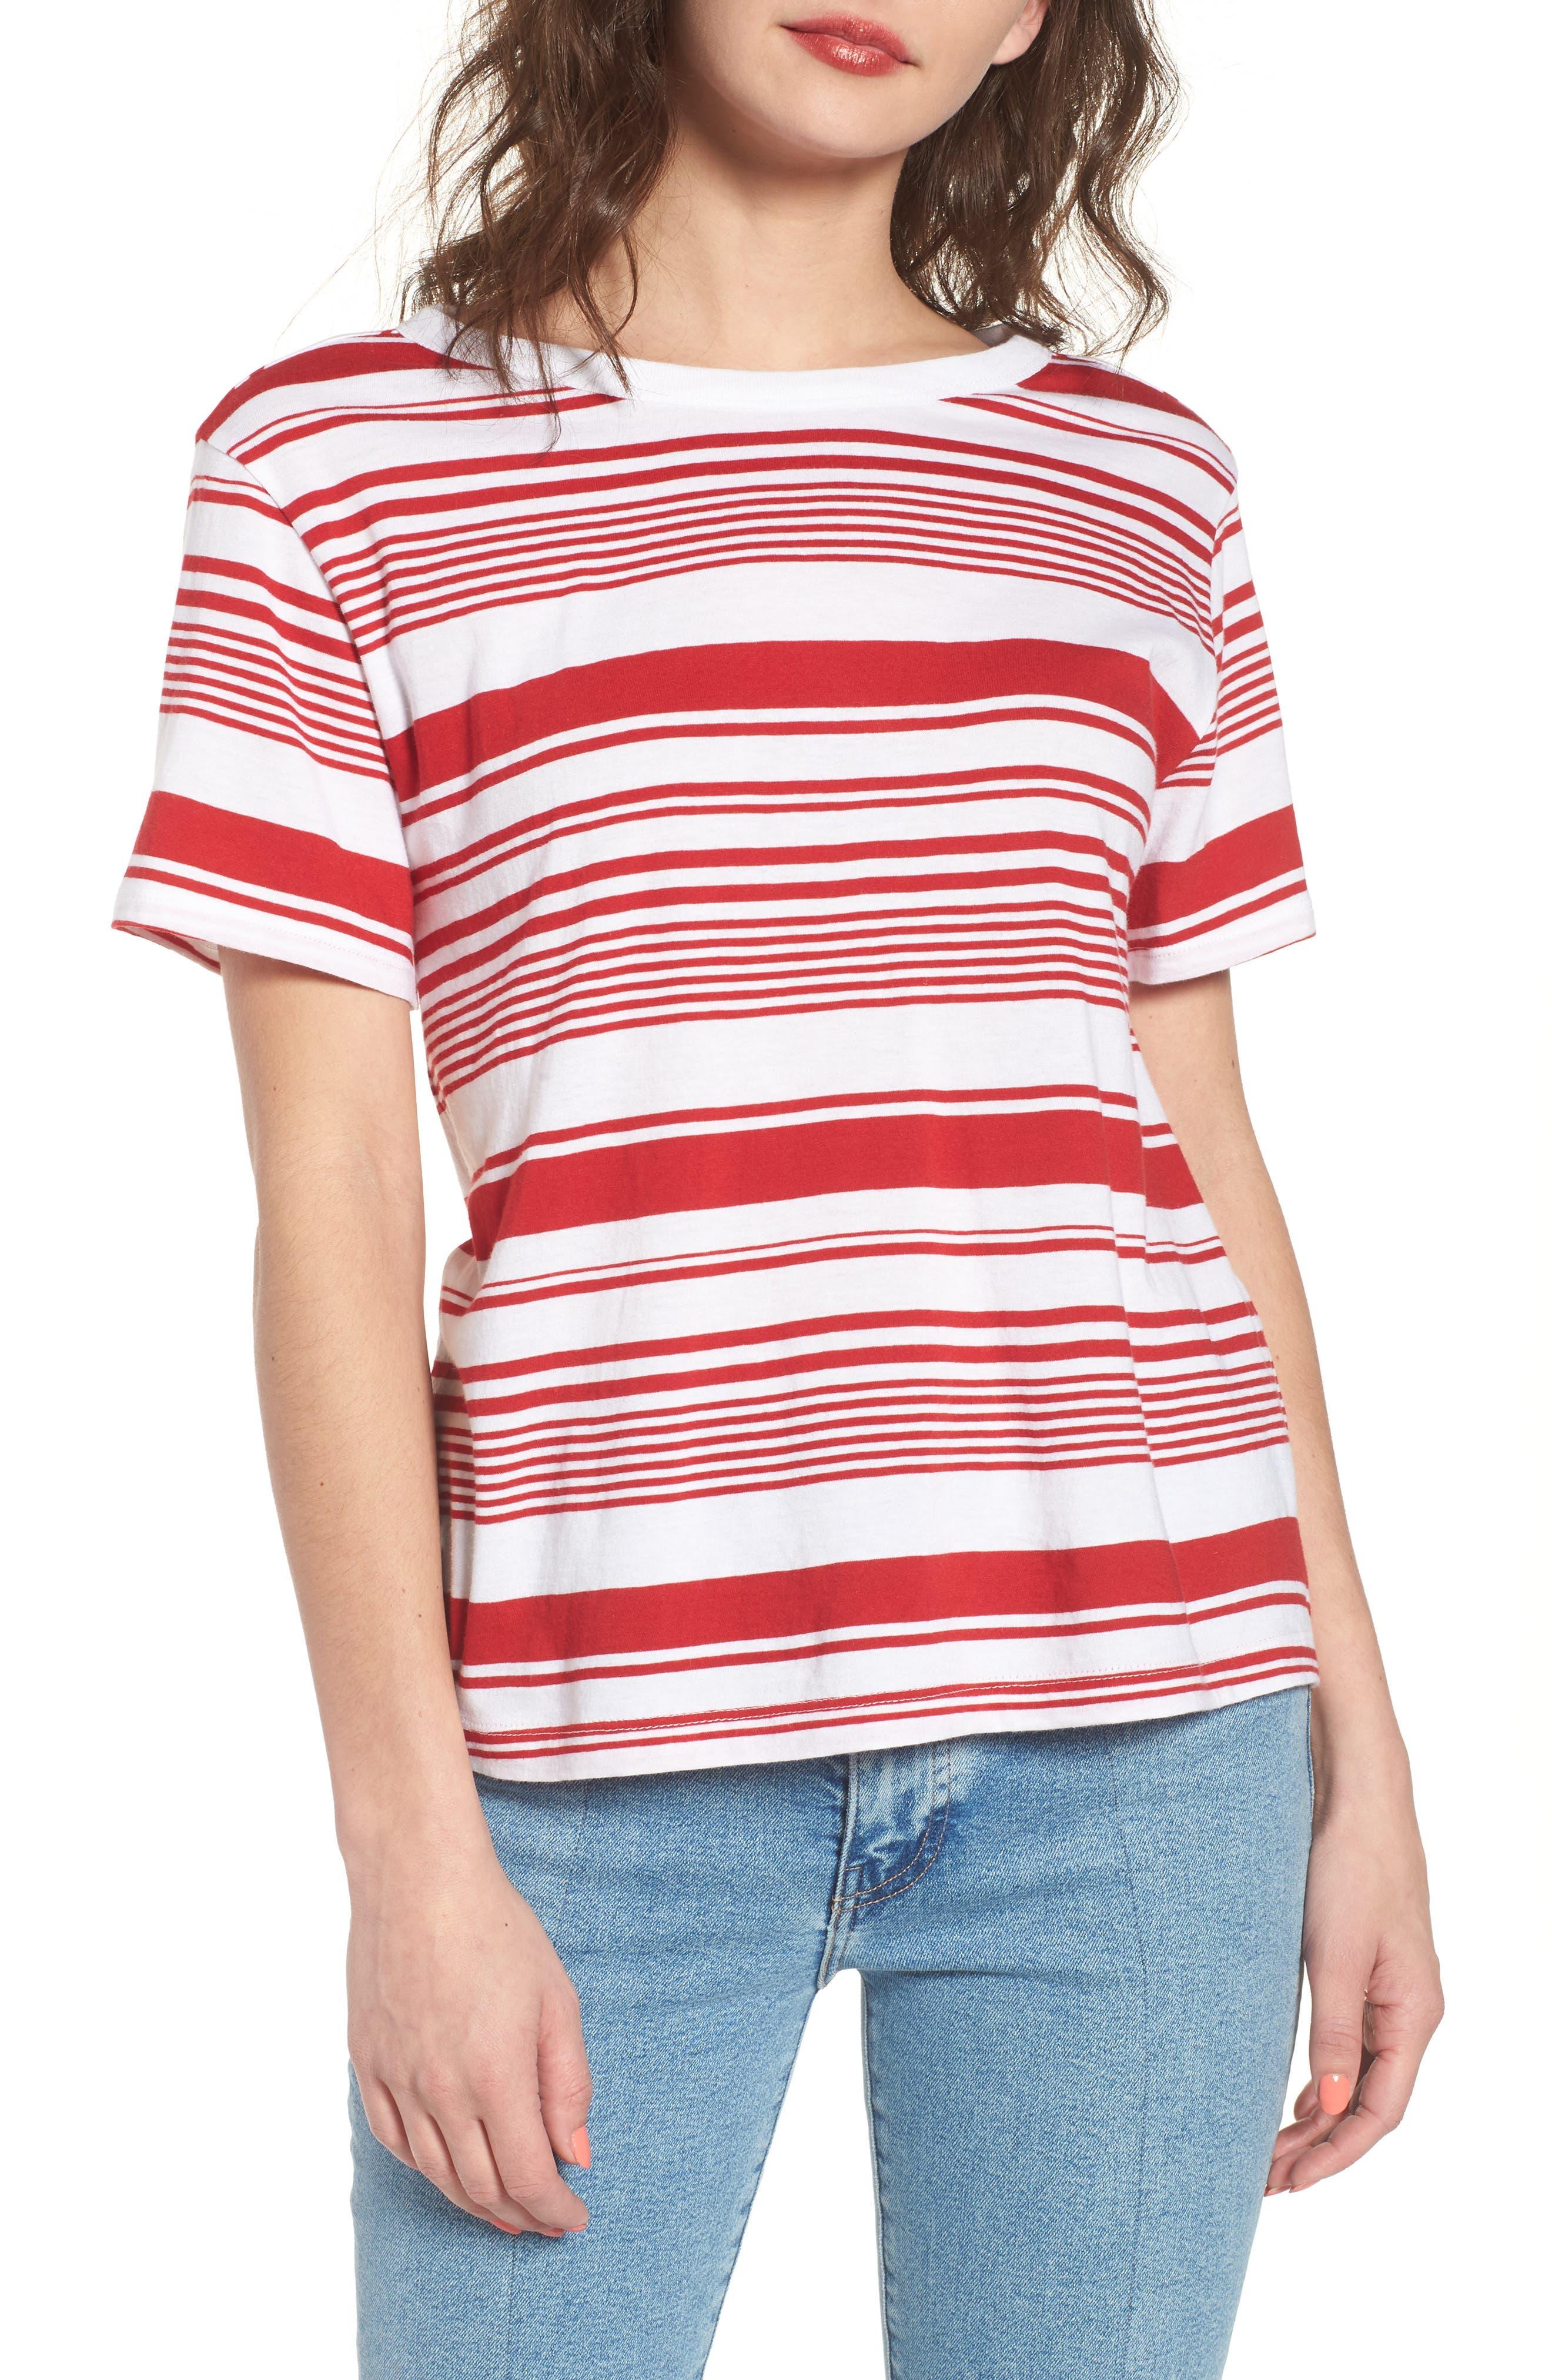 Twist Back Tee,                         Main,                         color, Red Couture Monaco Stripe